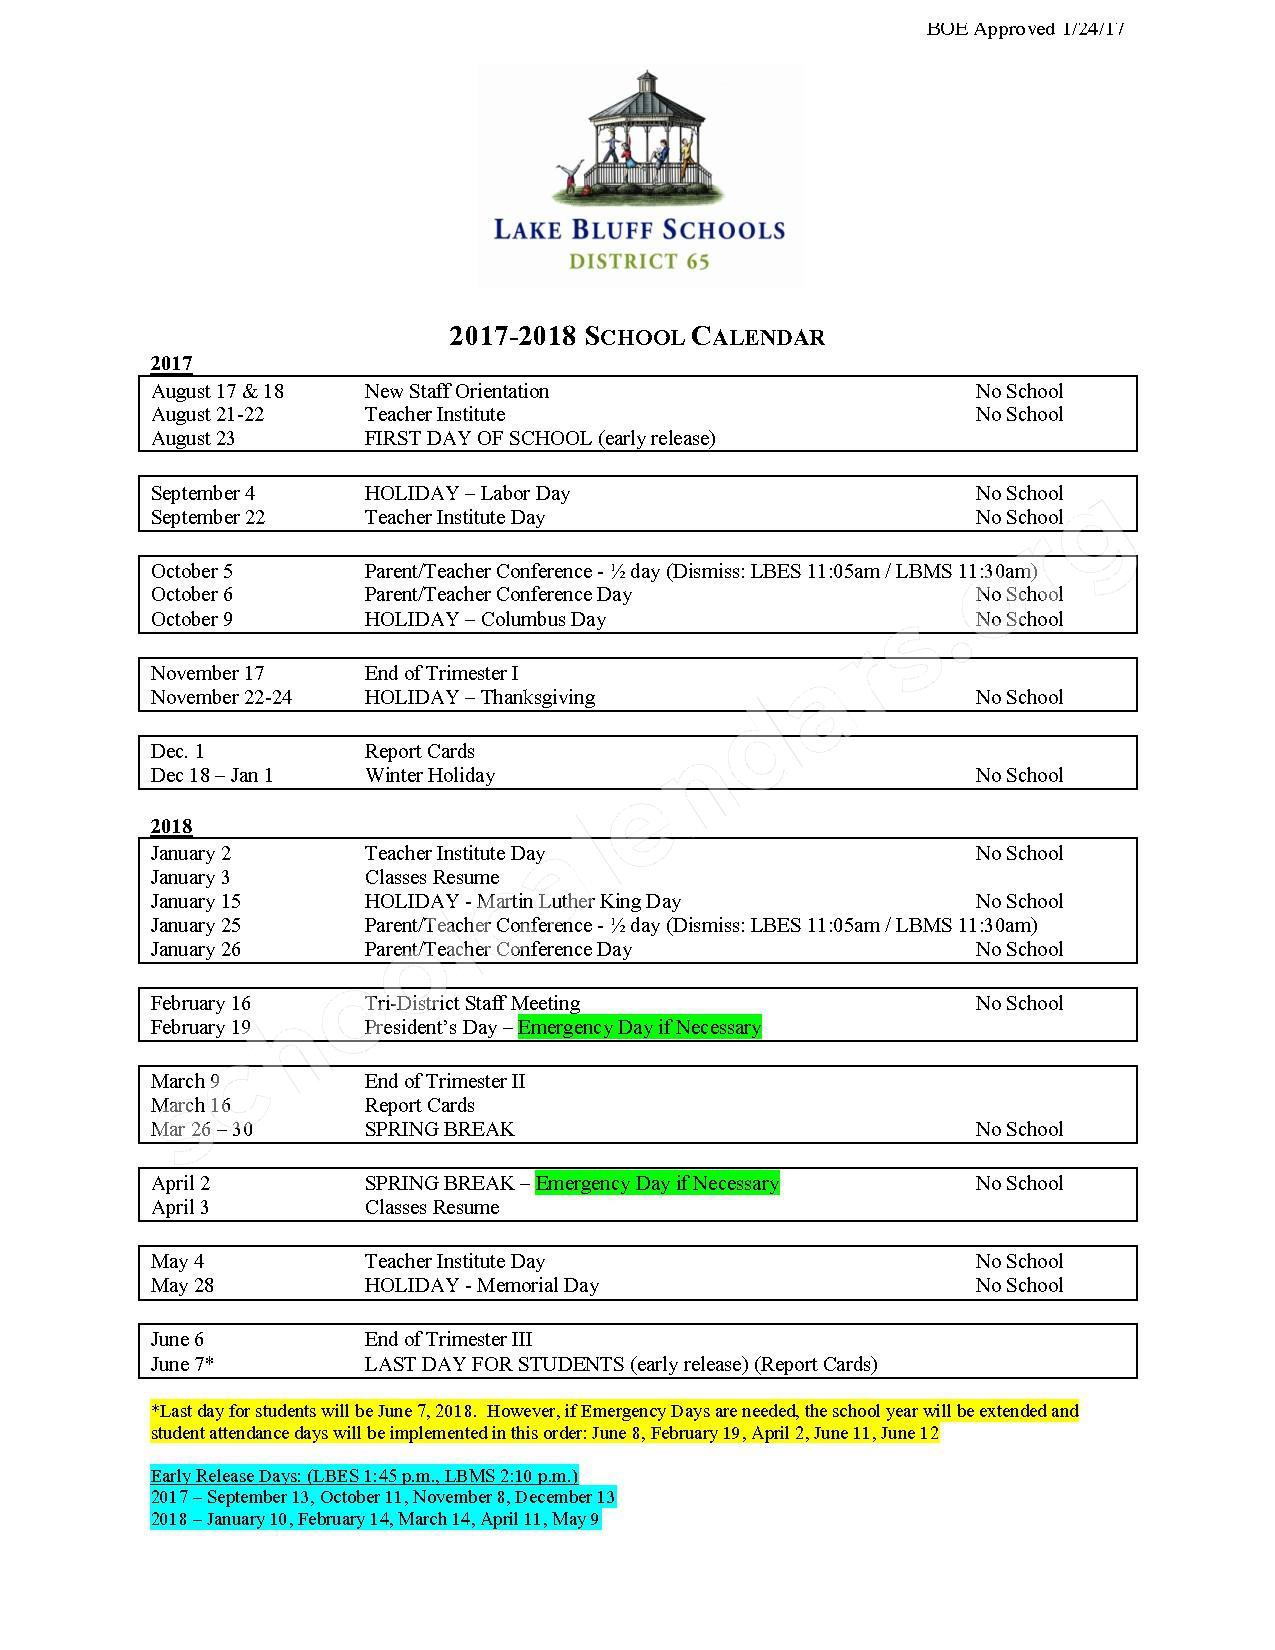 2017 - 2018 School Calendar – Lake Bluff Elementary School District 65 – page 1